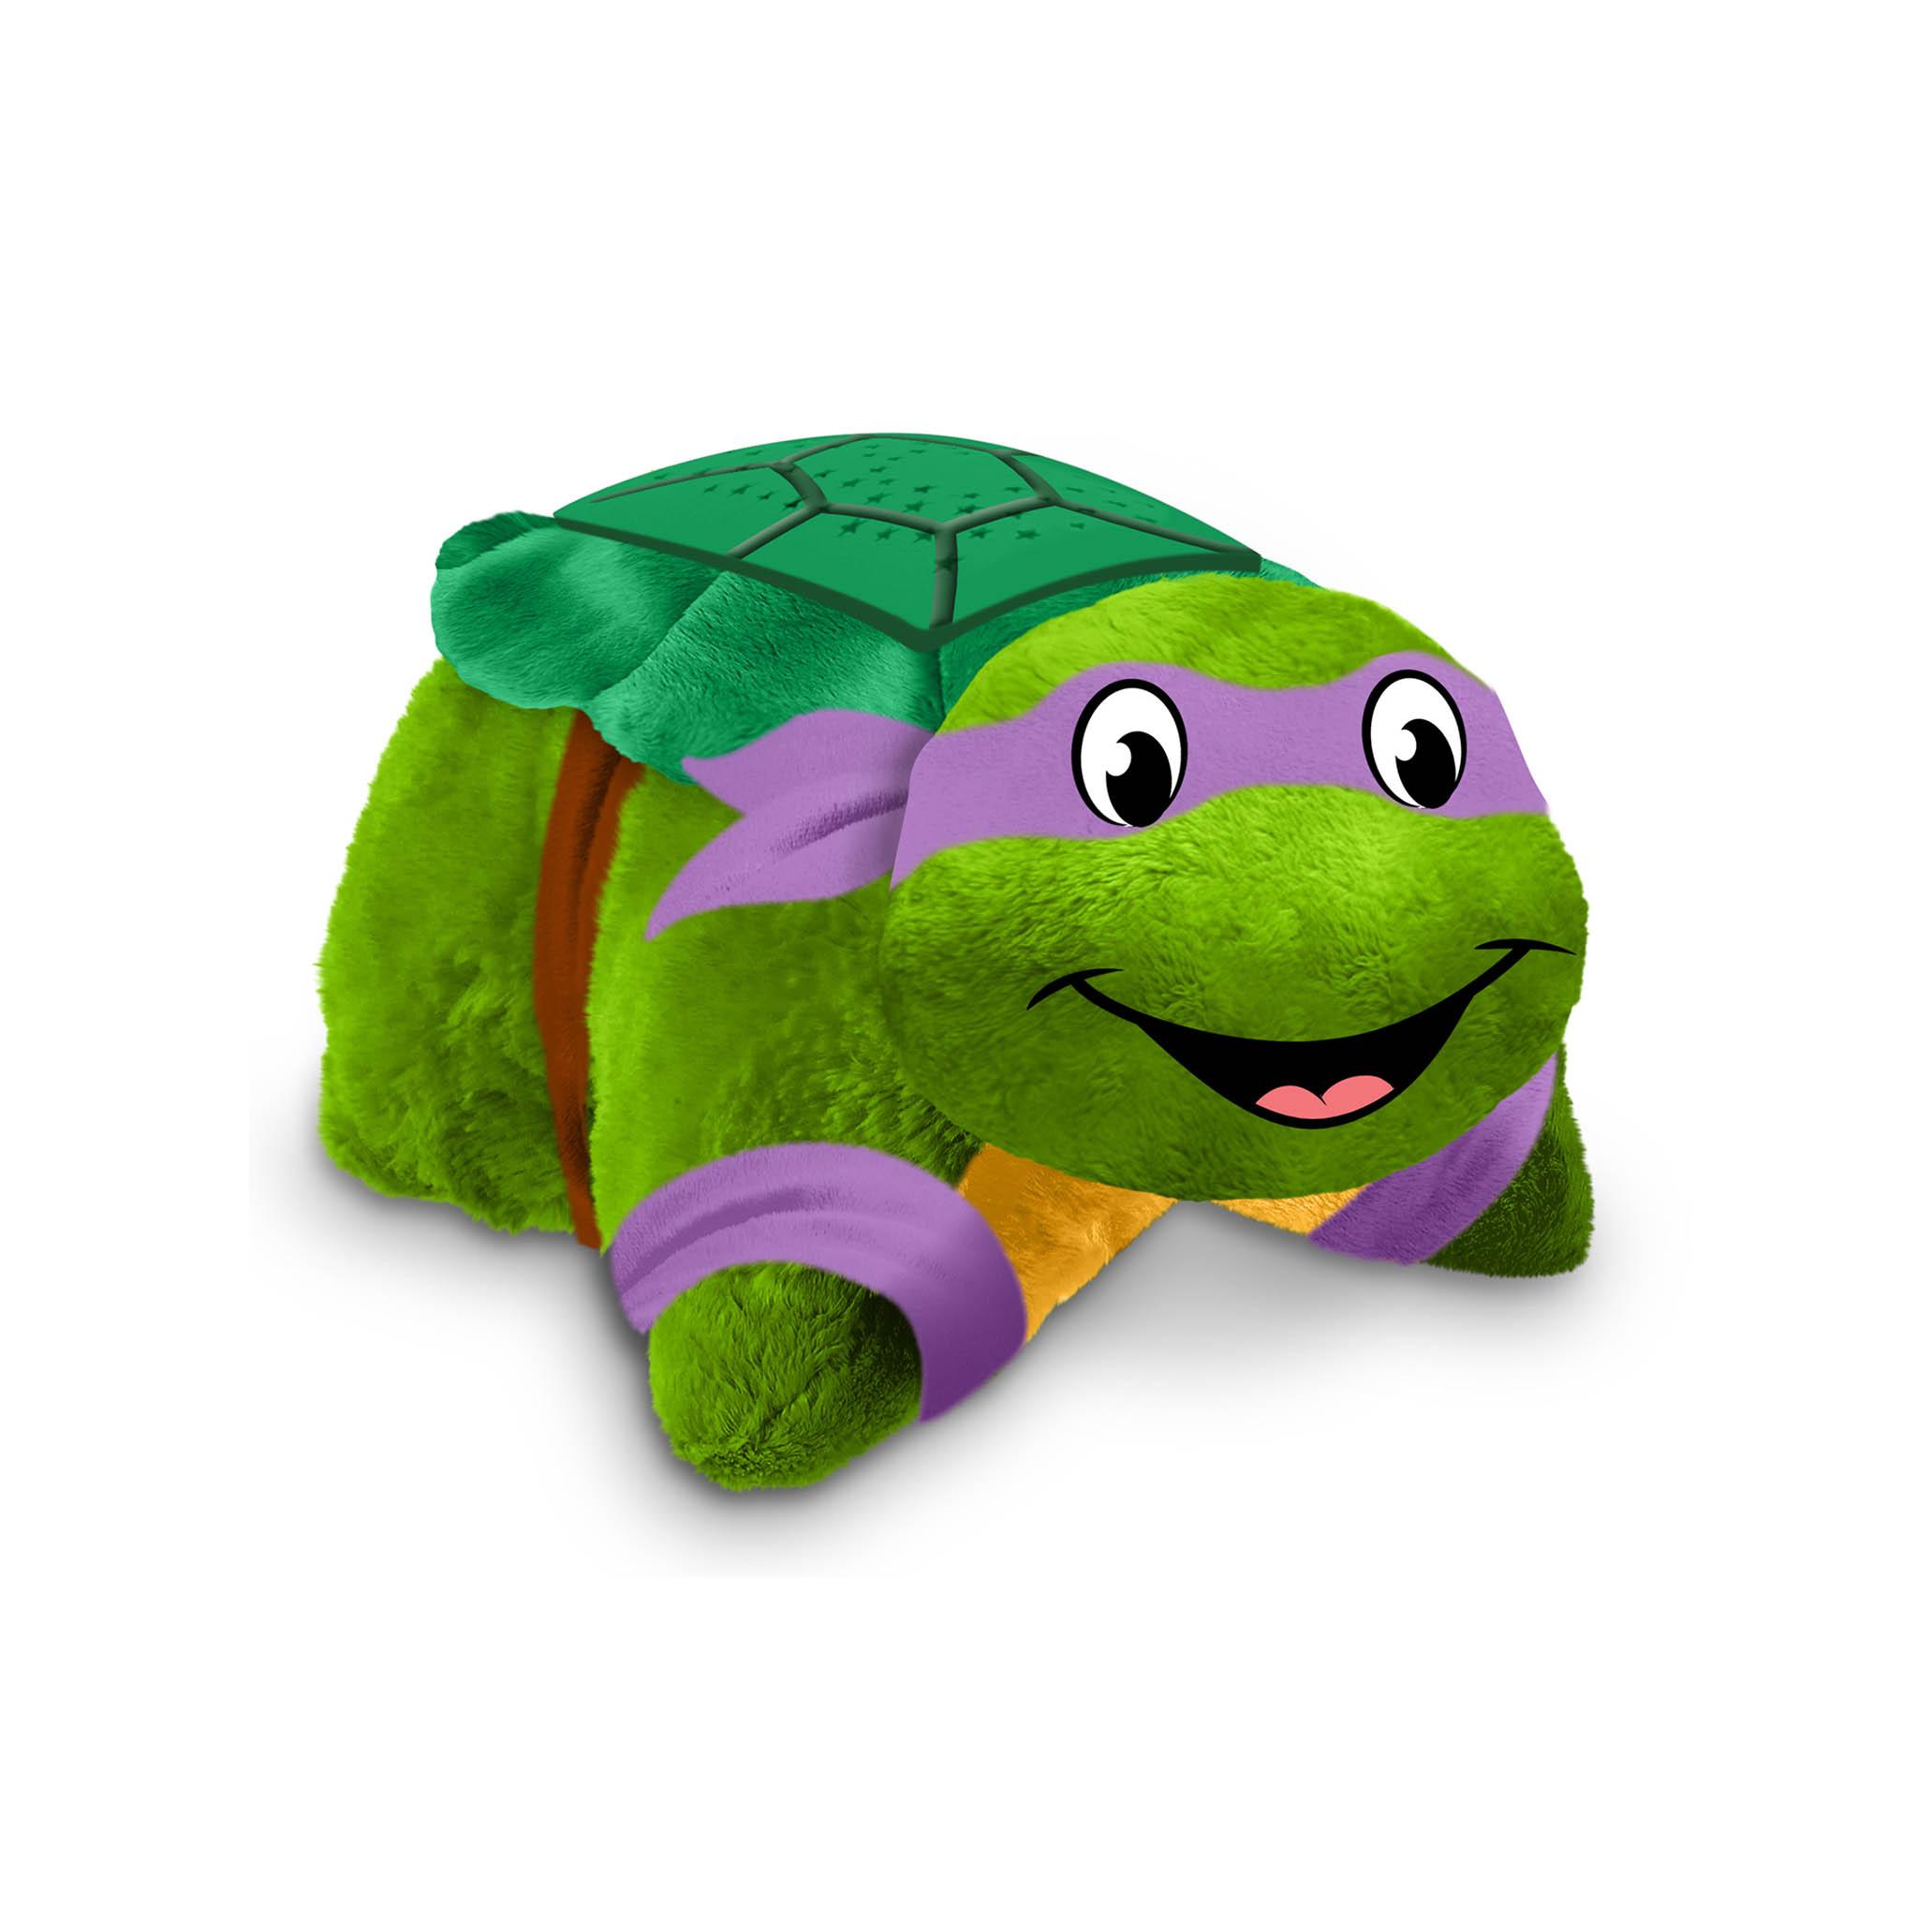 Donatello Ninja Turtle 2014